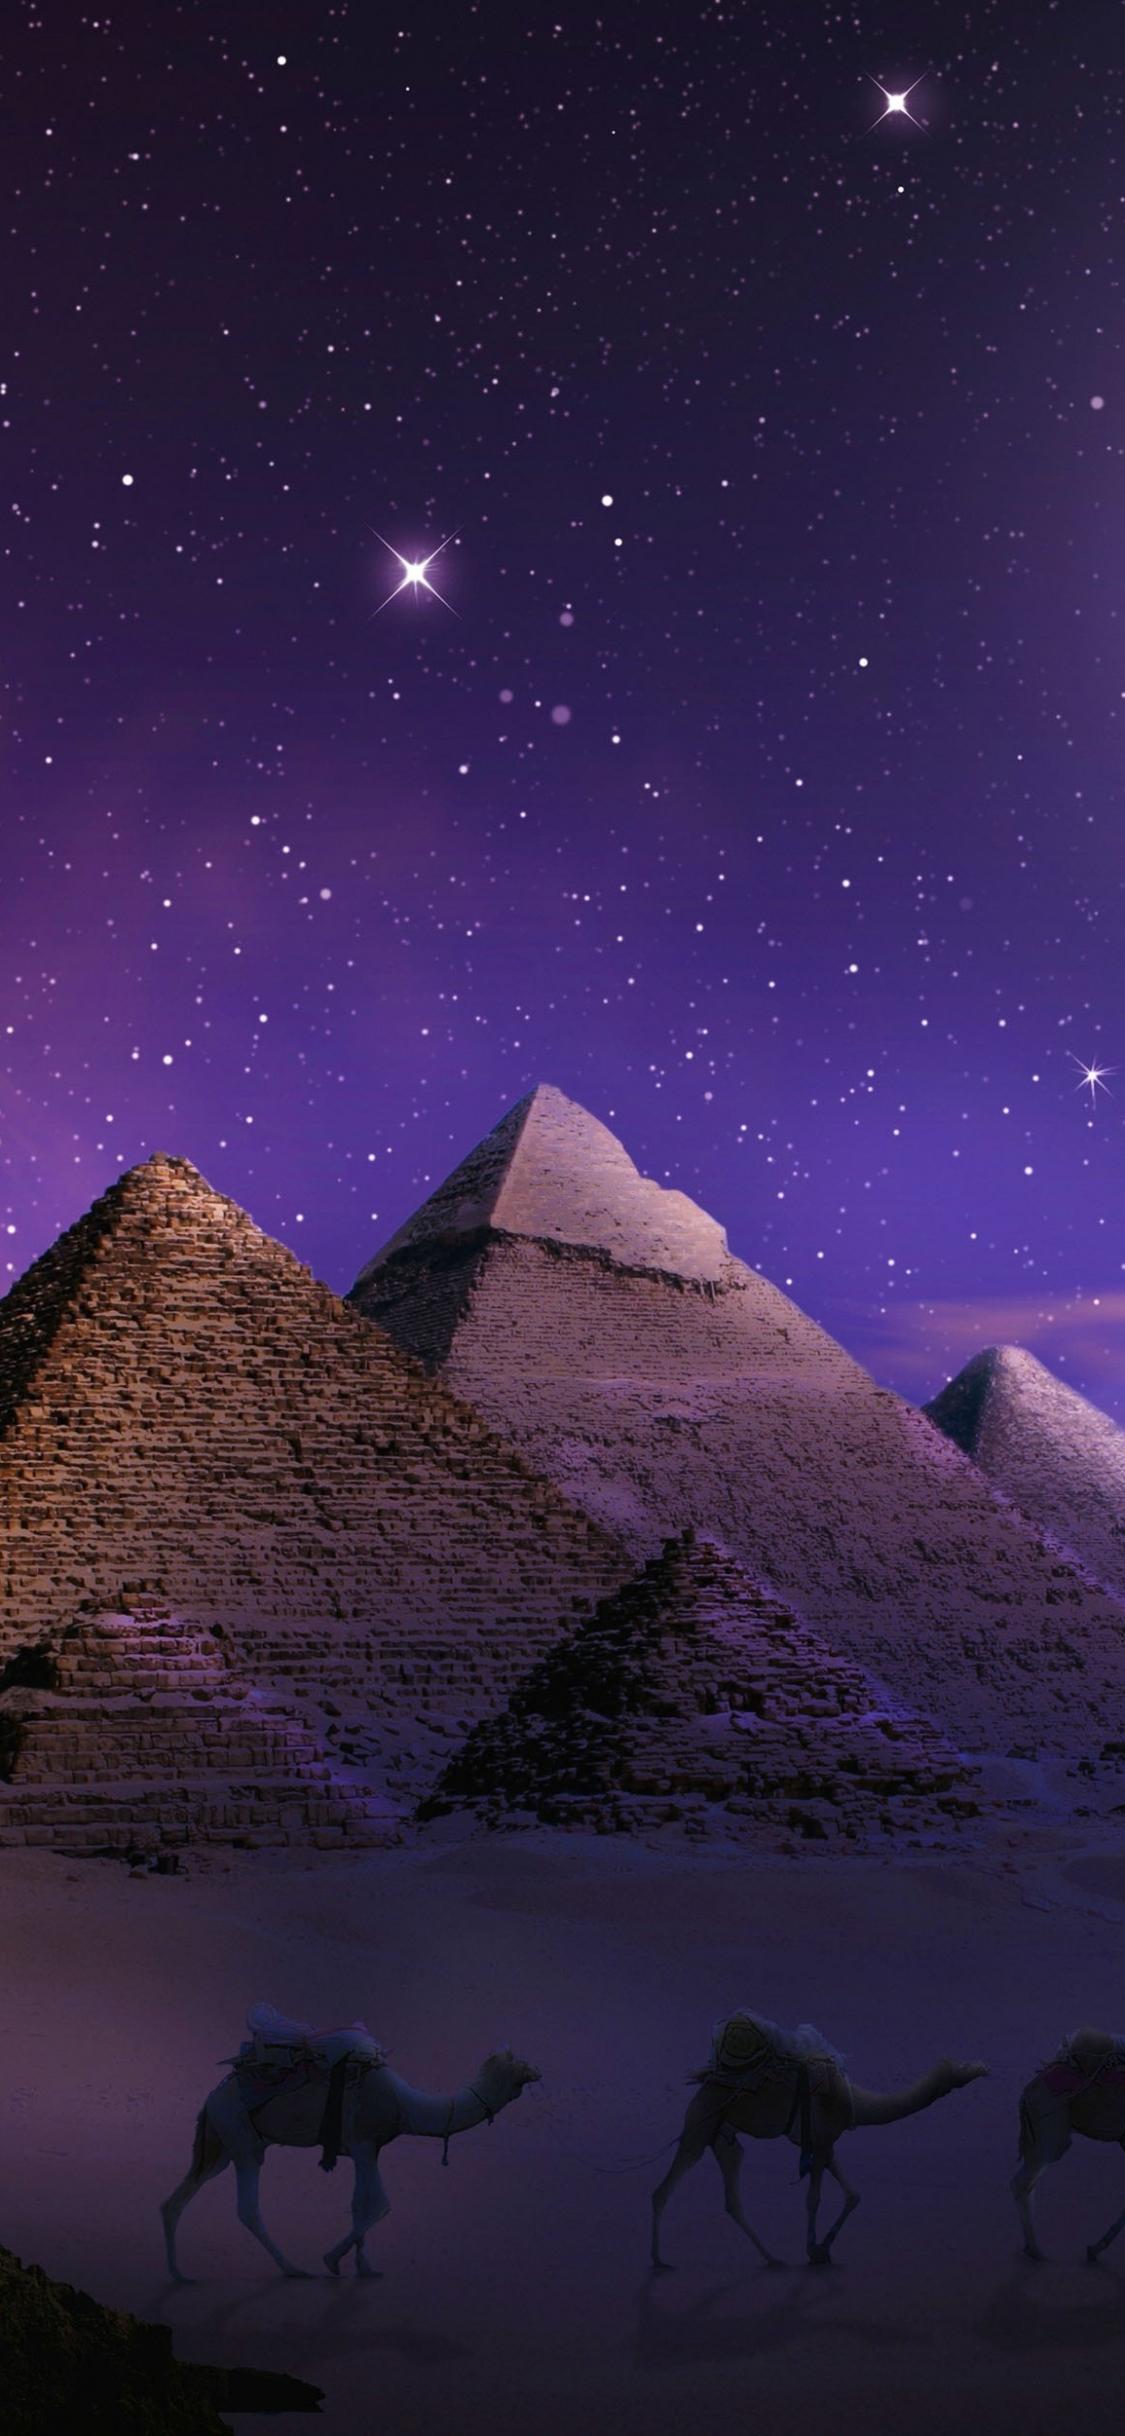 Download 1125x2436 Wallpaper Photoshop Pyramids Egypt